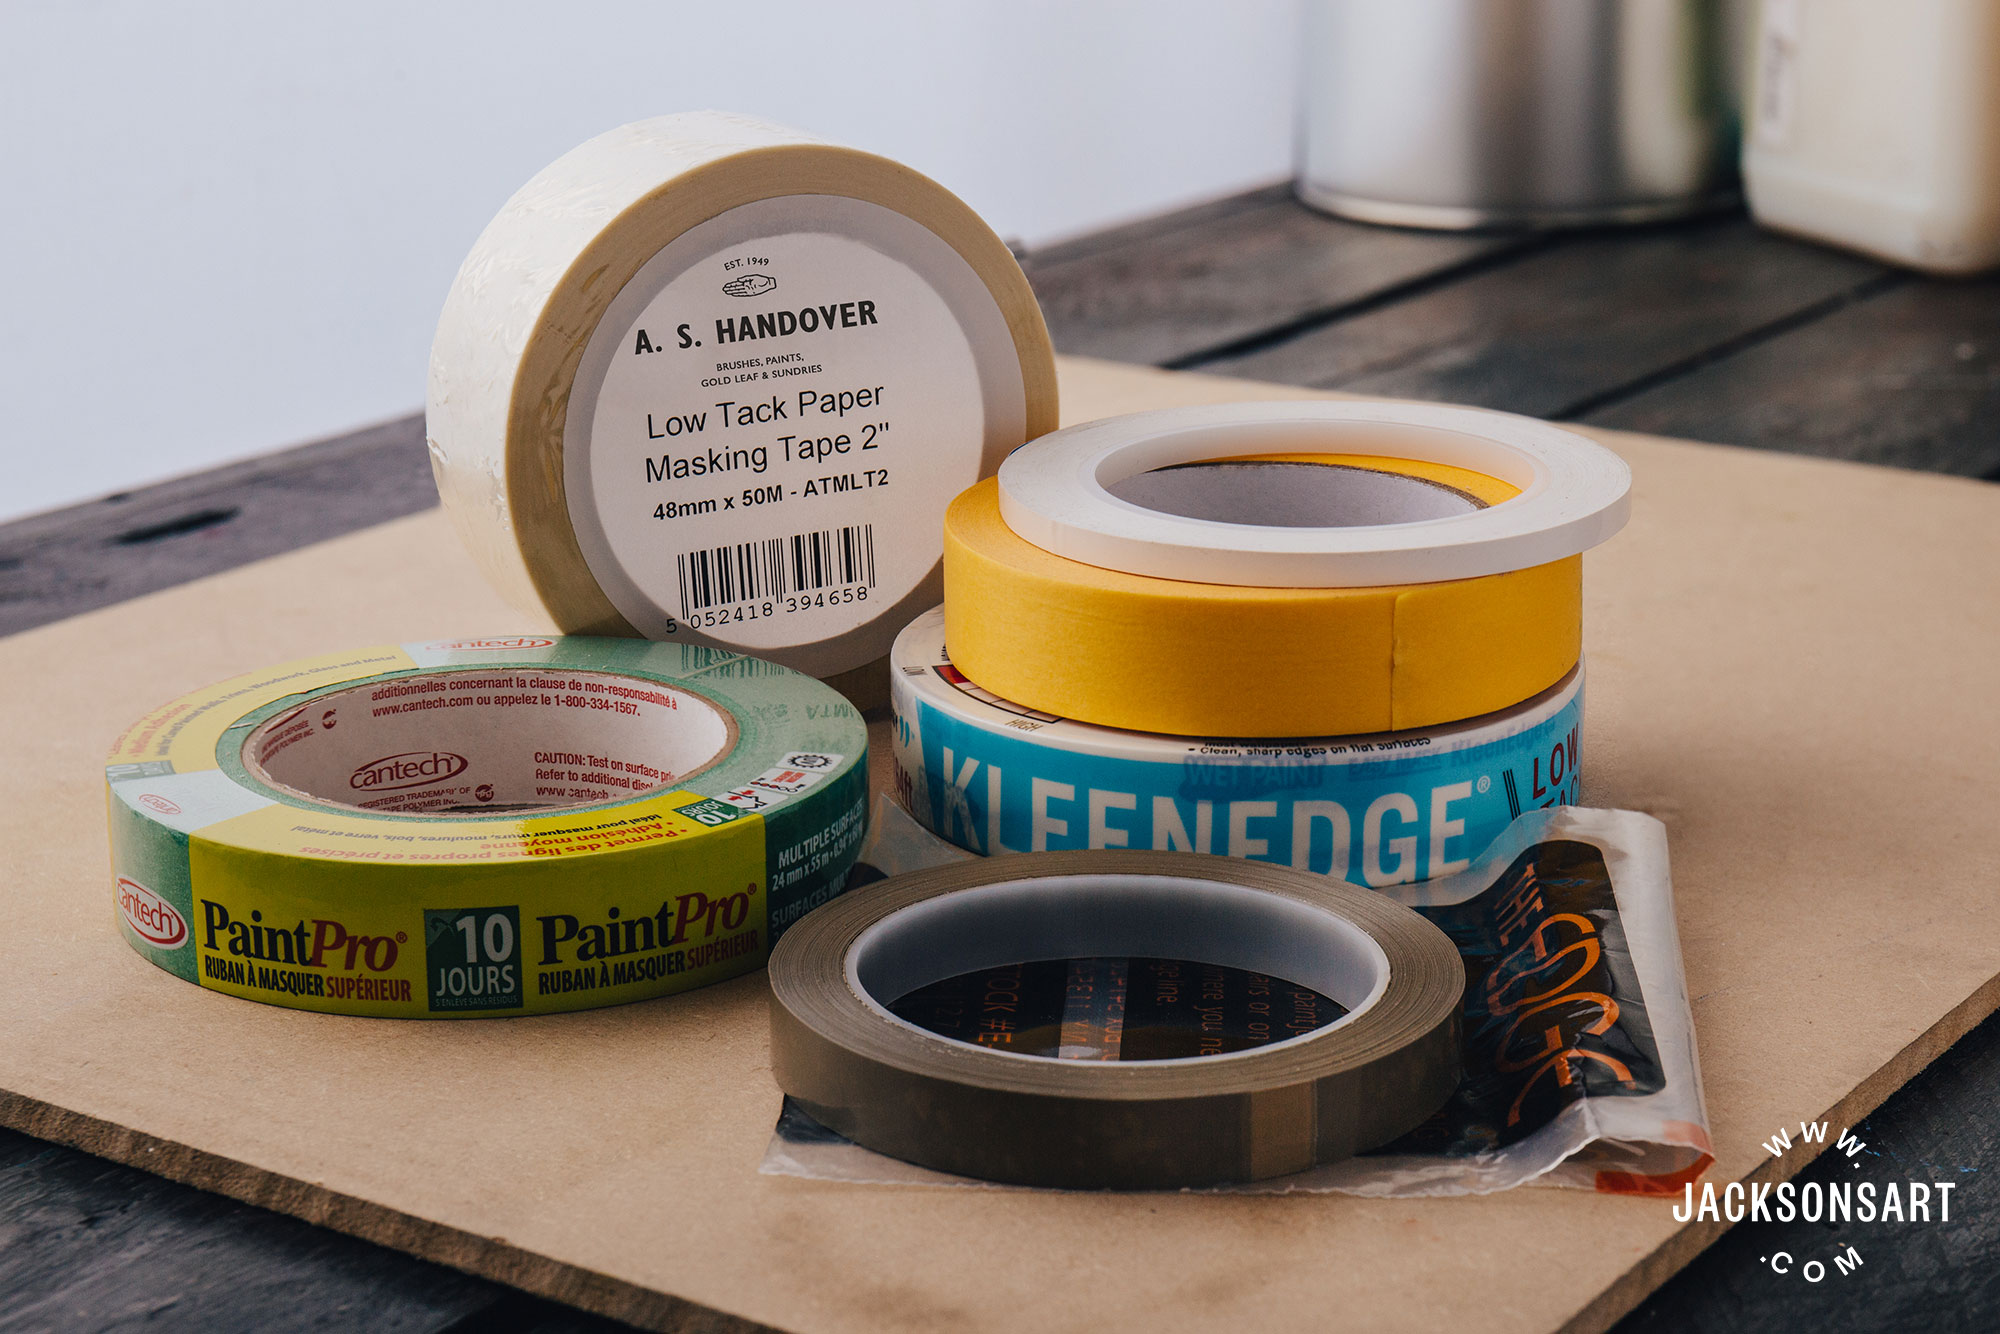 hard edge painting with masking tape